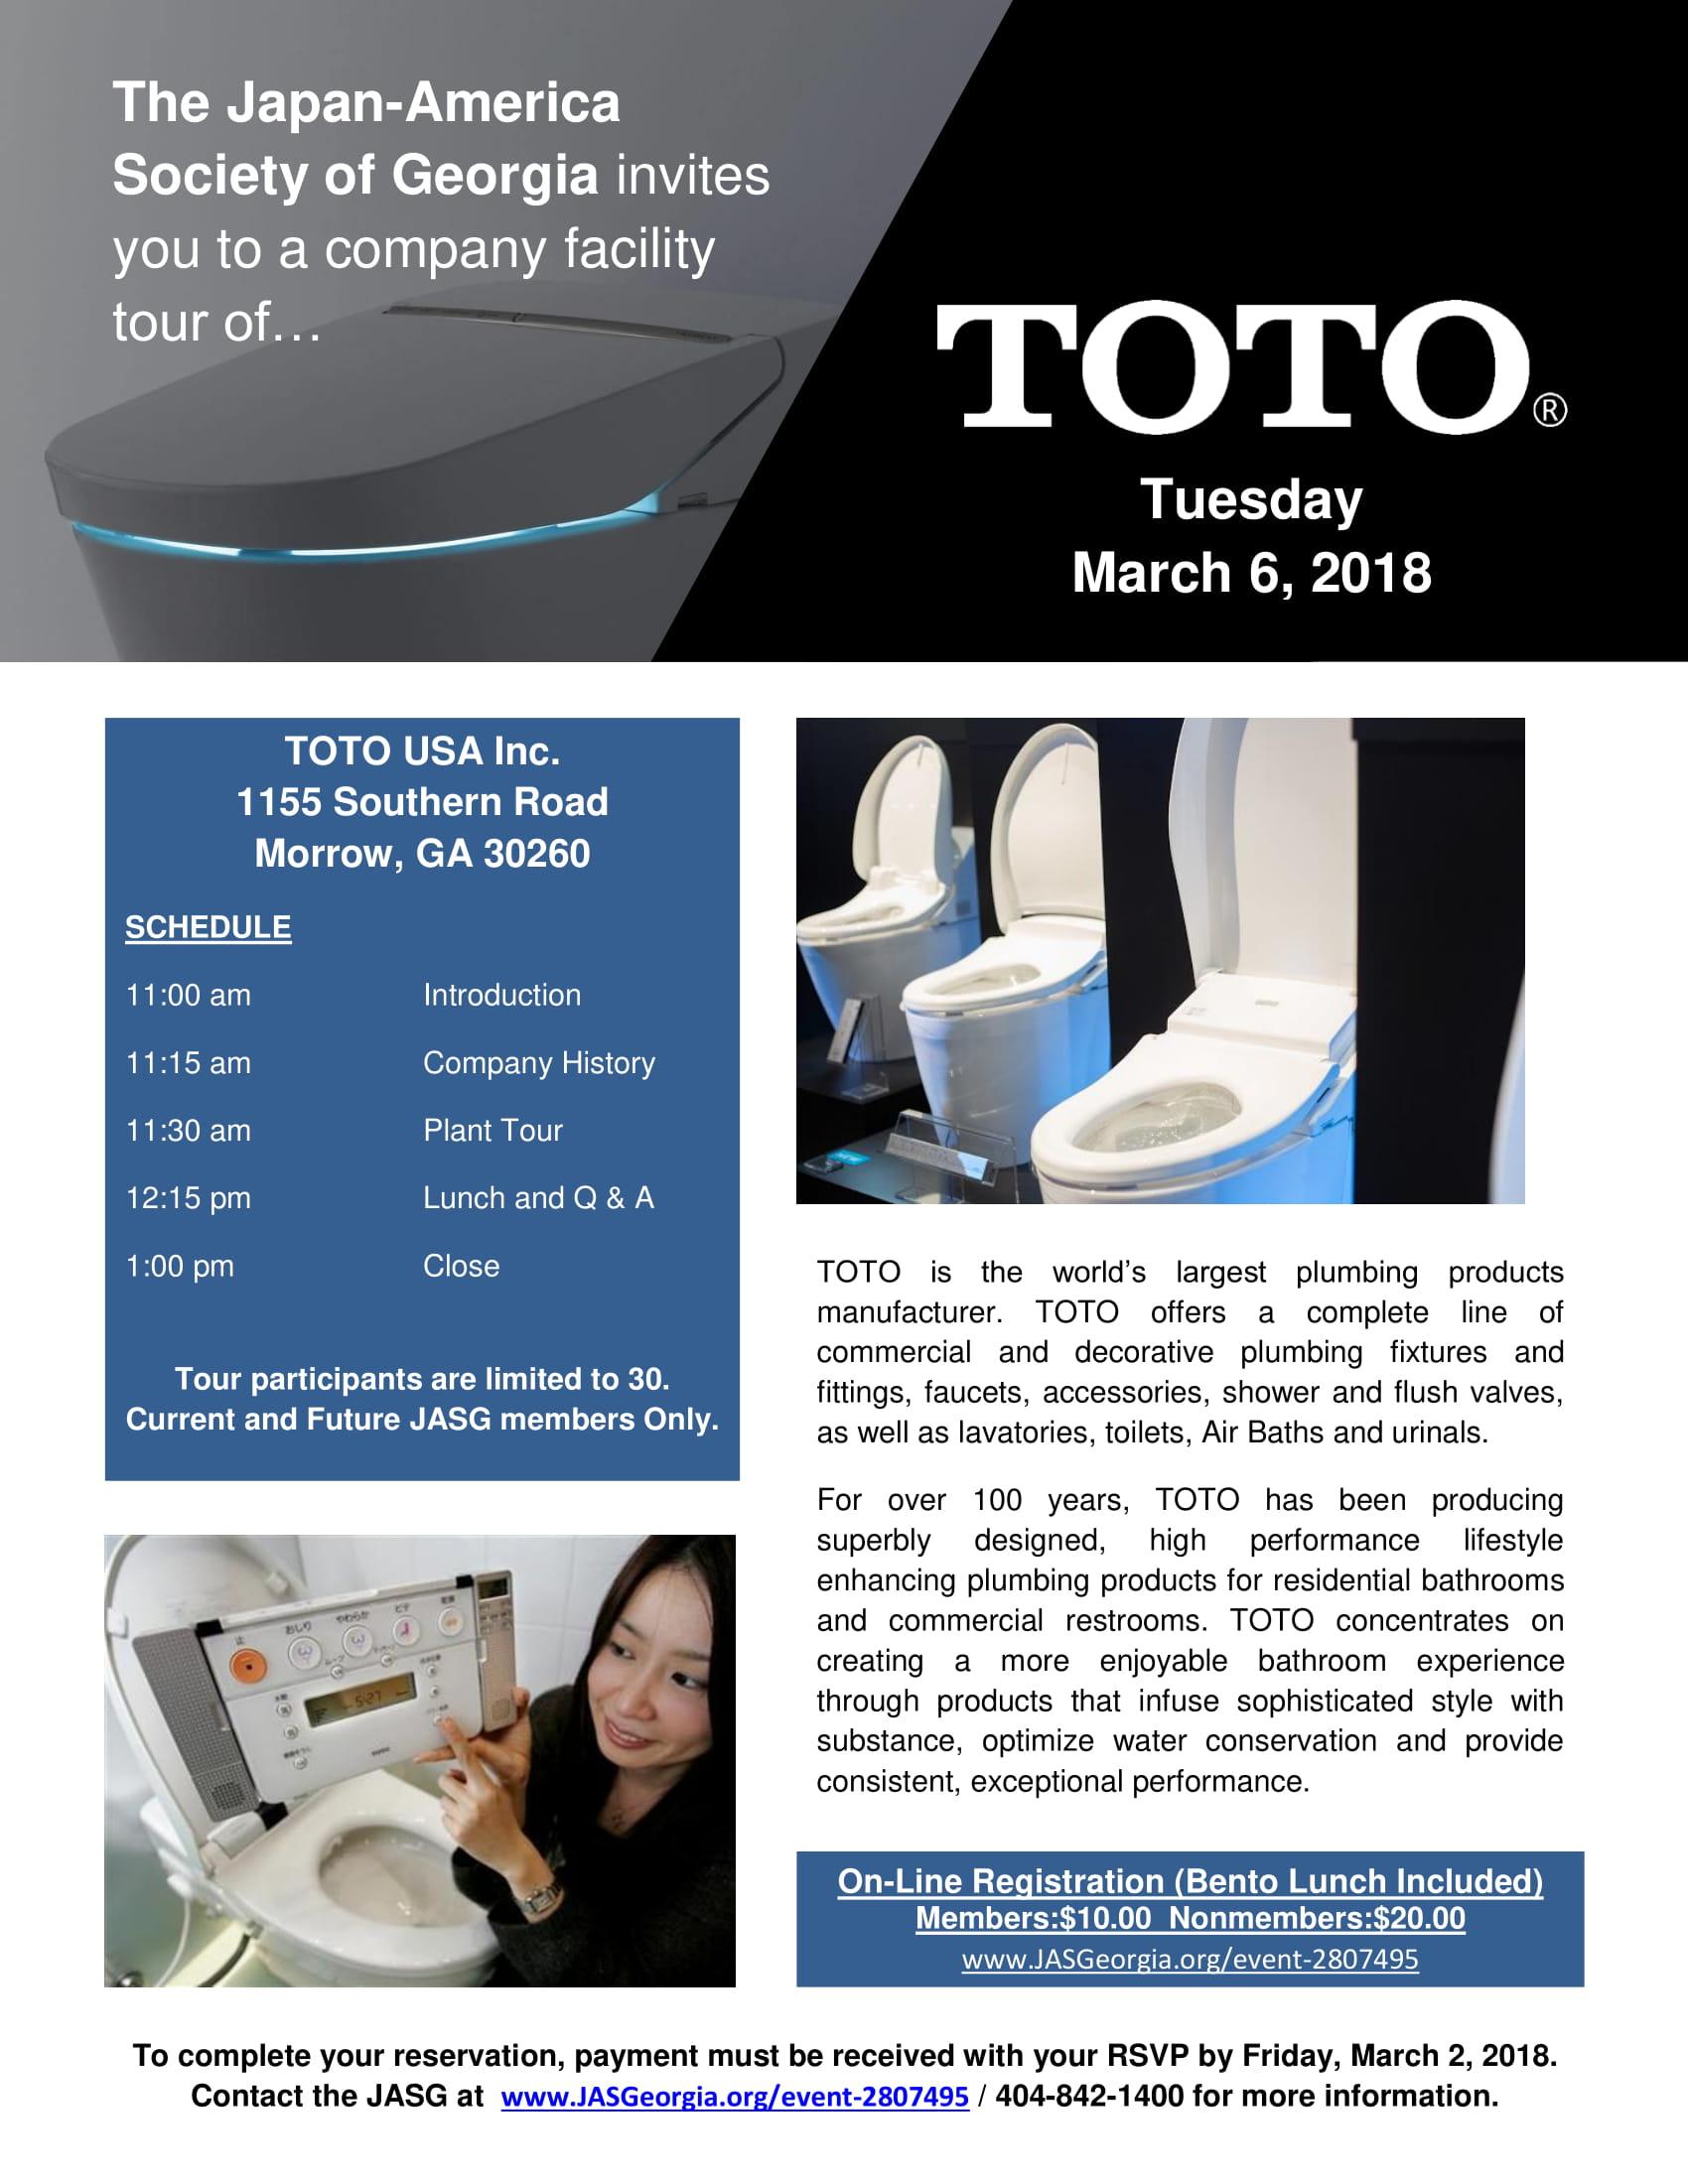 The Japan-America Society of Georgia - Tour of TOTO USA